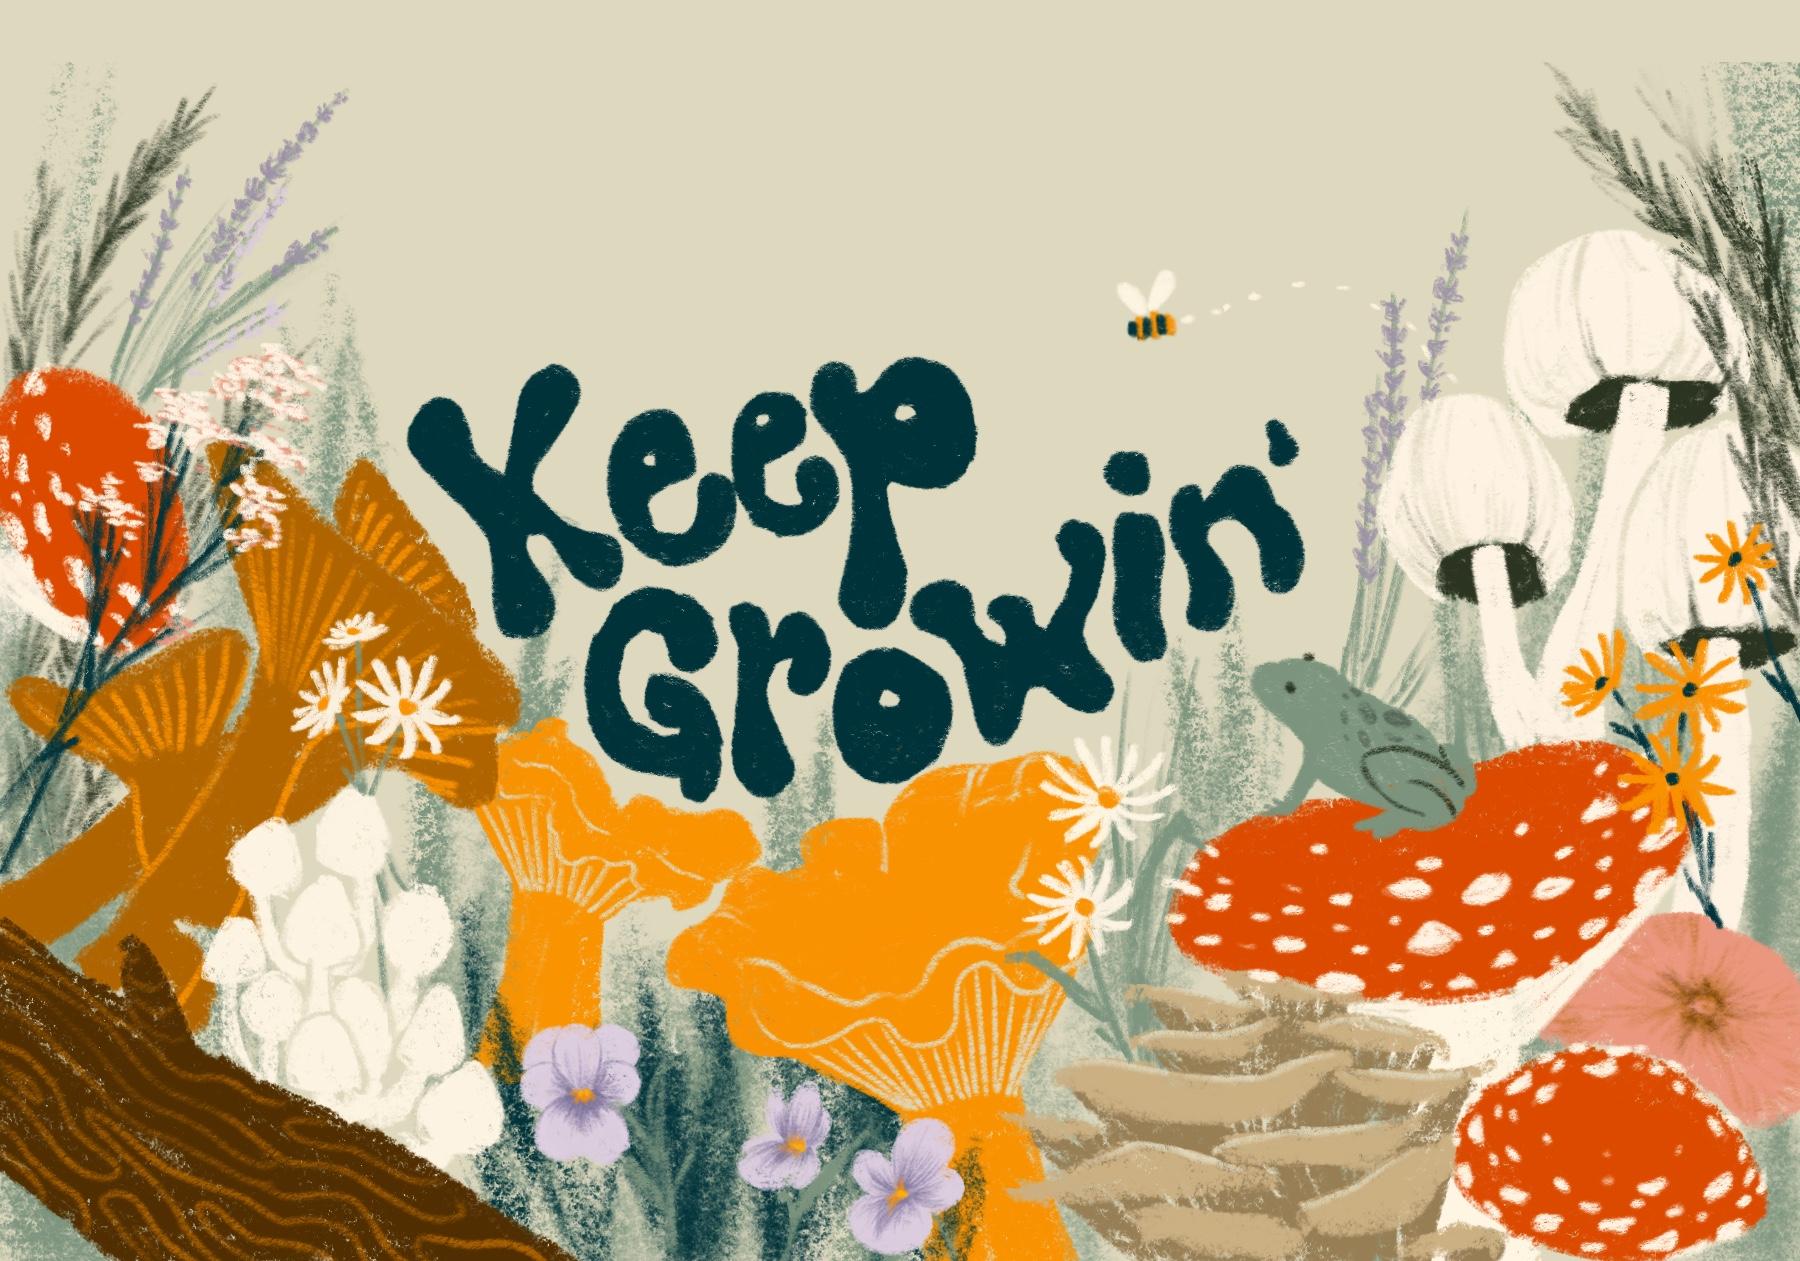 Keep growin